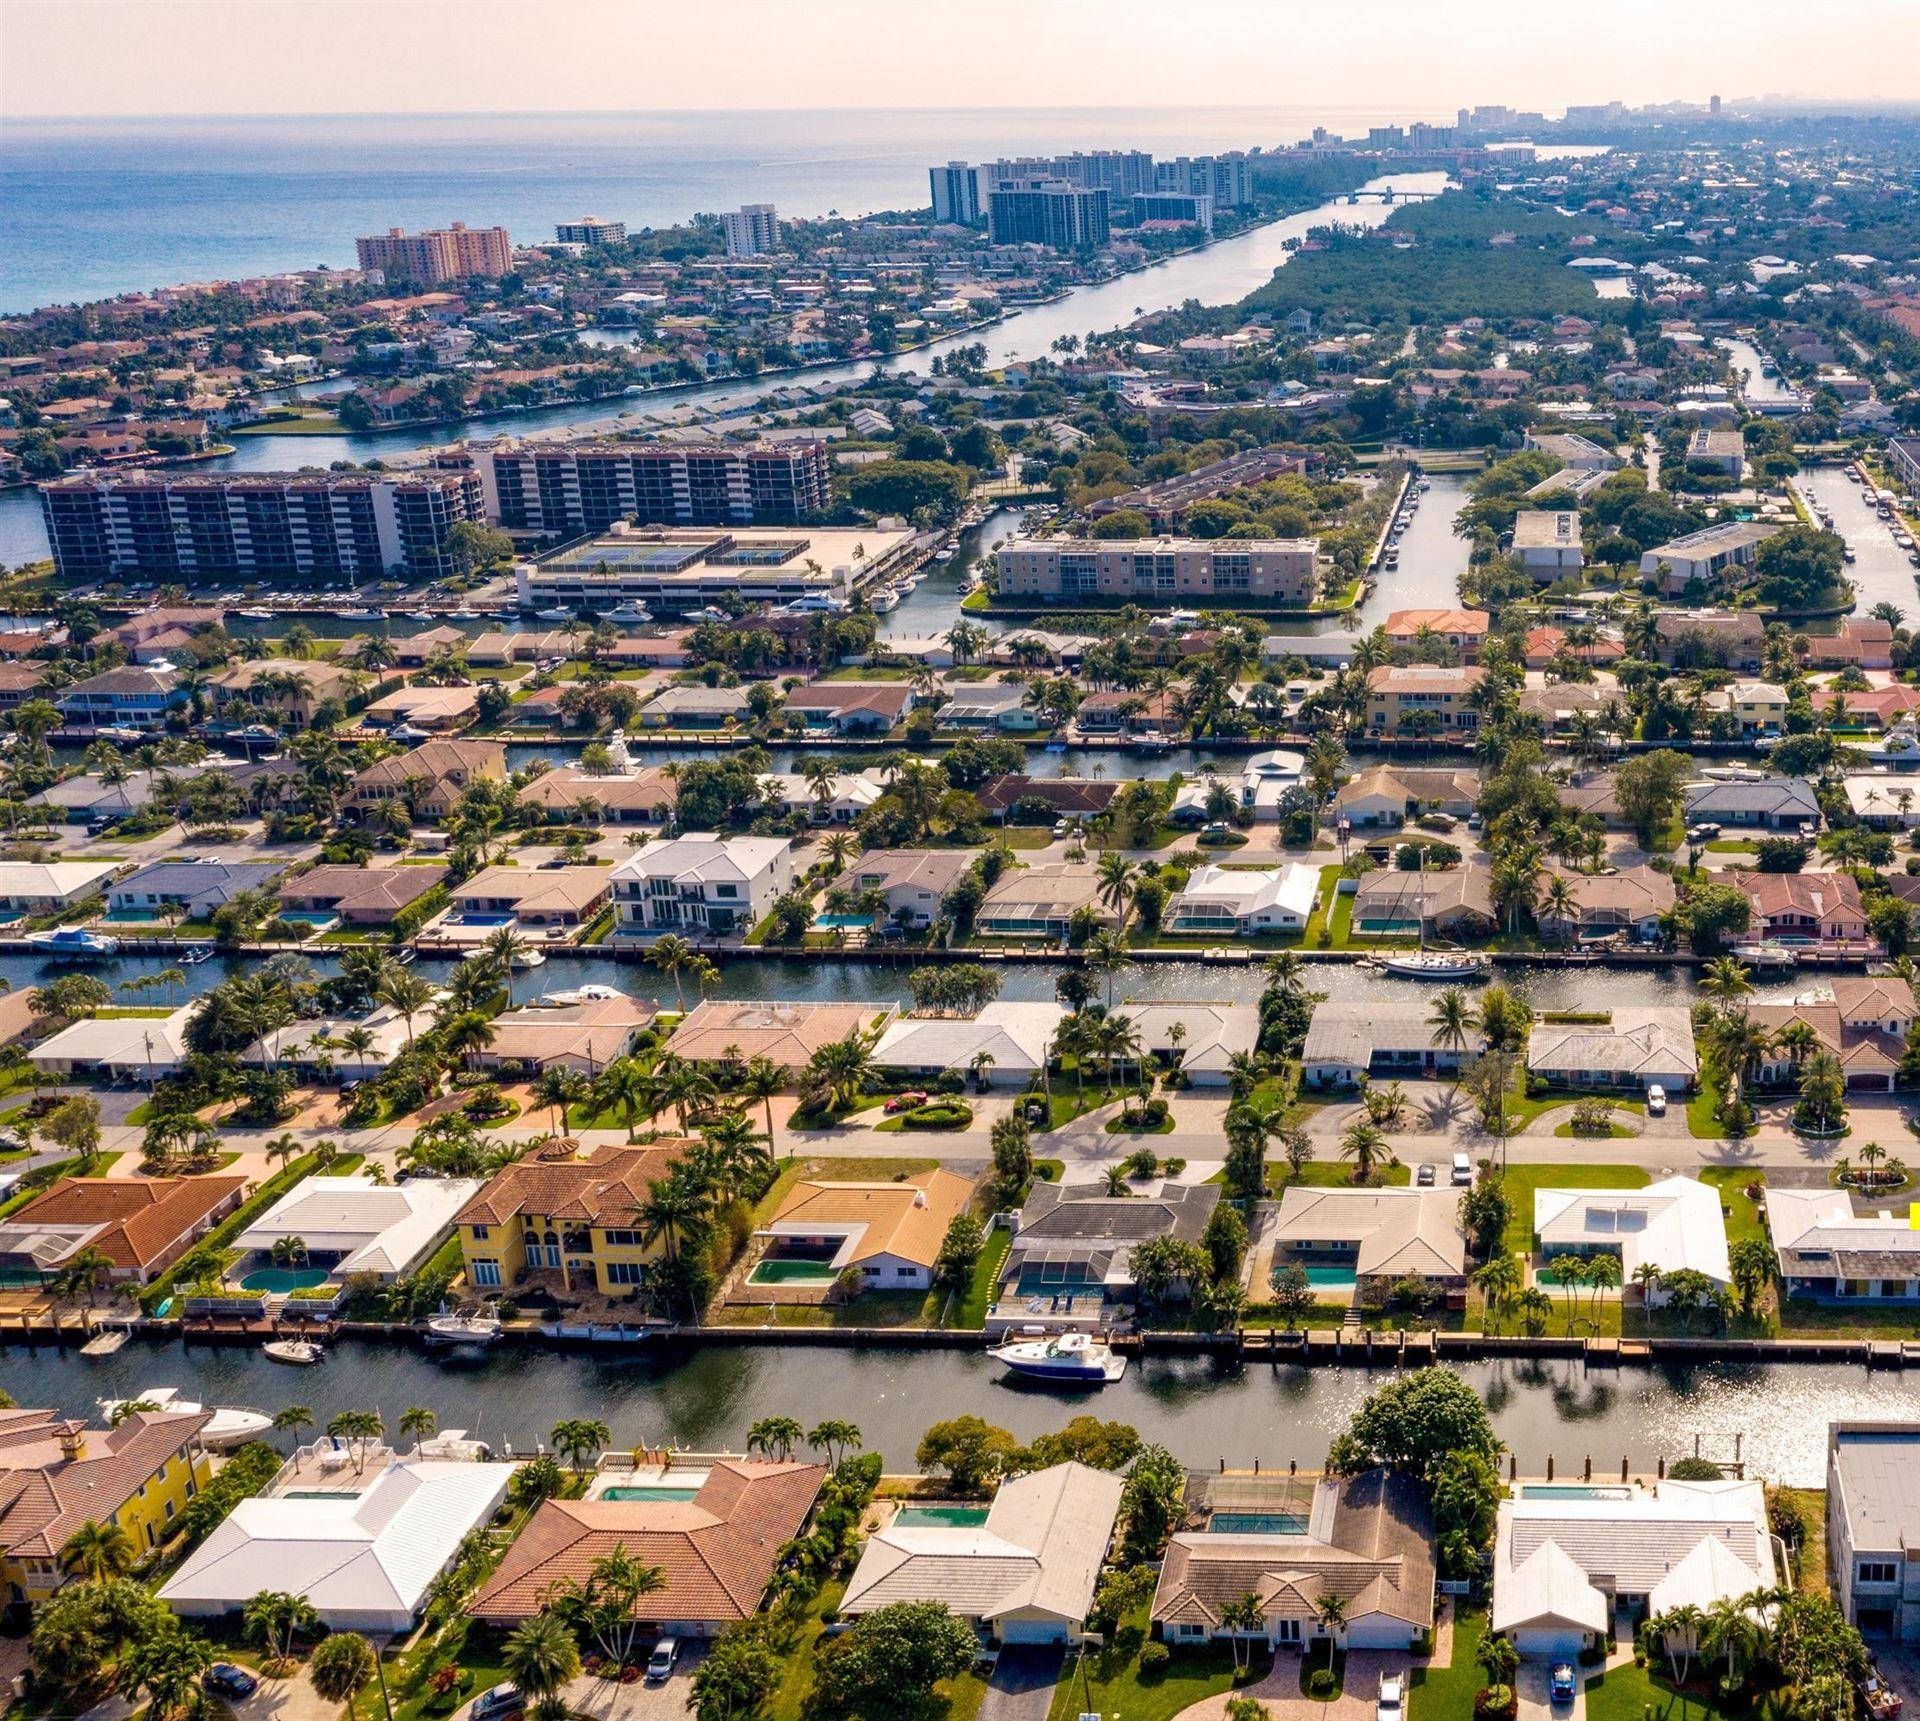 824 Enfield Street, Boca Raton, FL 33487 - MLS#: RX-10700506